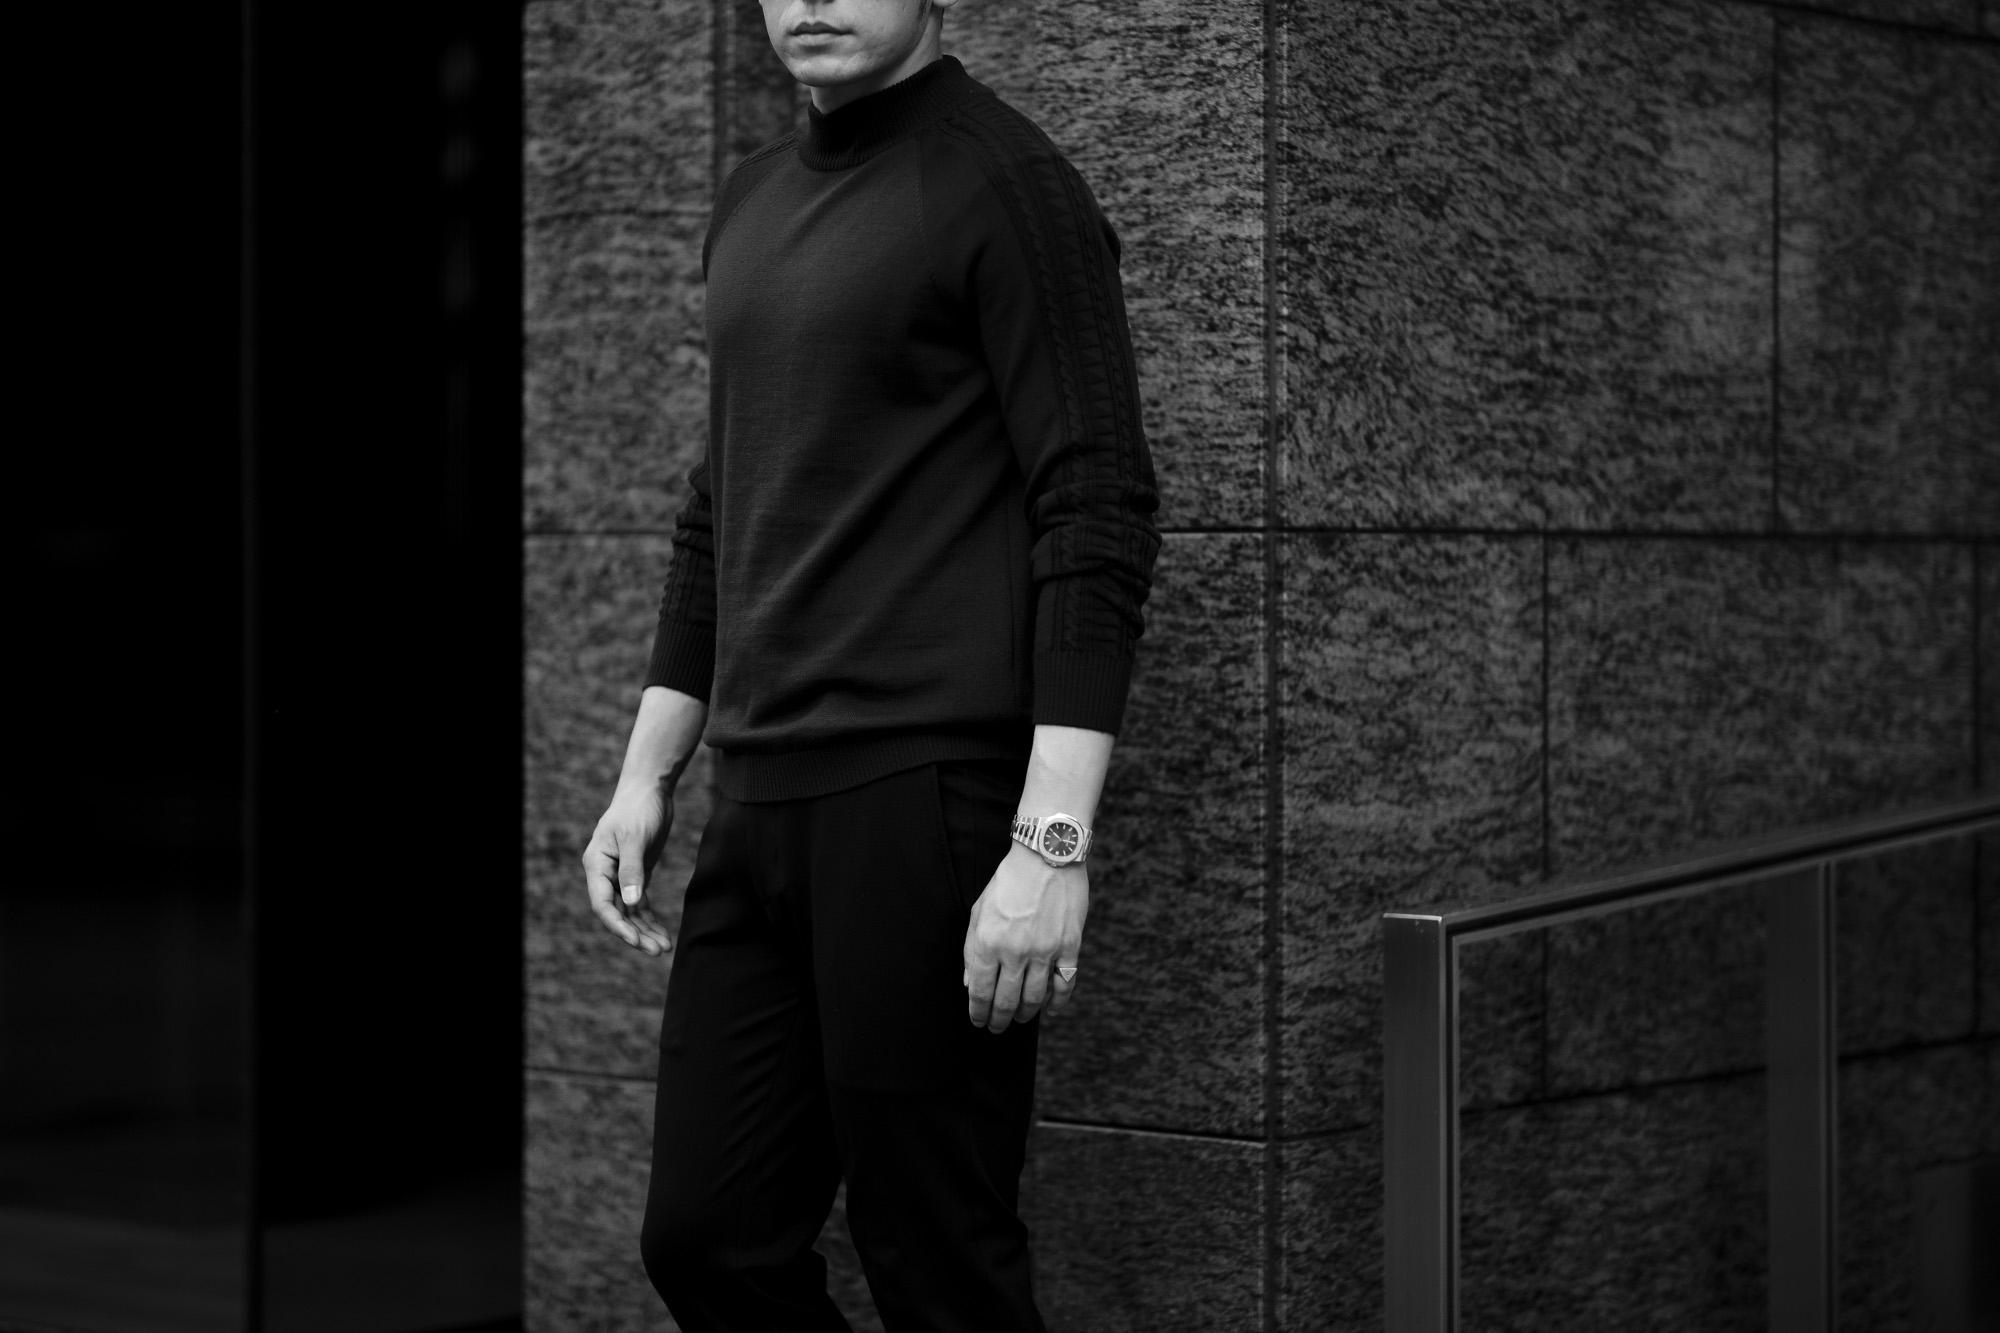 RIVORA (リヴォラ) SIDE CABLE Mock Neck Pull-Over (サイドケーブル モックネック プルオーバー) SUPER120s Wool サイドケーブル ウール モックネック セーター BLACK (ブラック・010) MADE IN JAPAN (日本製) 2021 秋冬 【Alto e Diritto 別注】【Special Model】Alto e Diritto altoediritto アルトエデリット